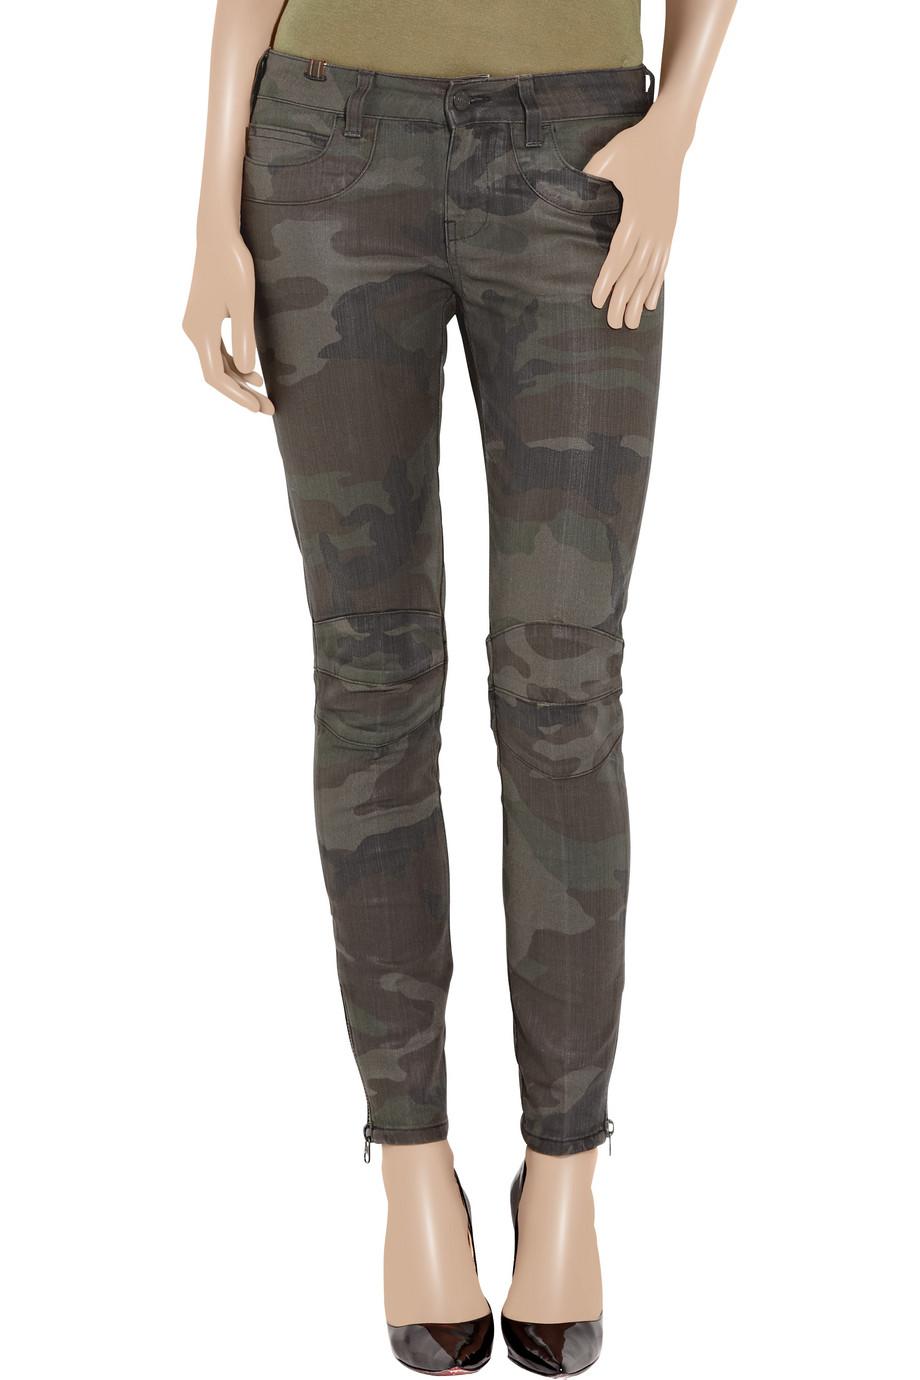 Notify Bamboo 75 Biker Low-rise Skinny Jeans in Green